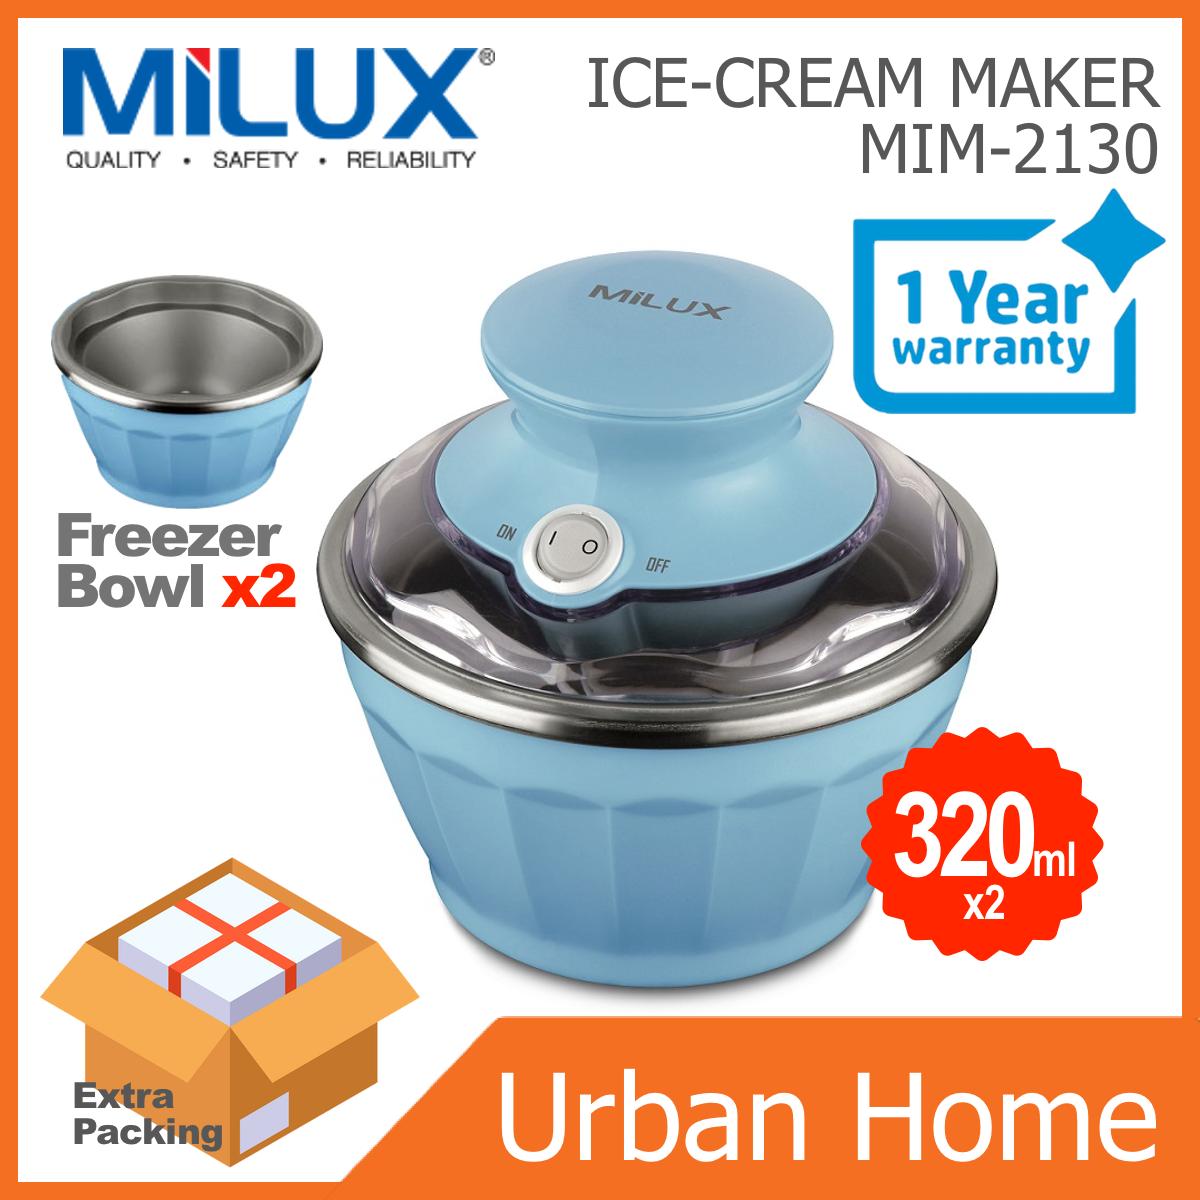 MILUX Delicate Ice Cream Maker Pembuat Ais Krim (MIM-2130/MIM2130)